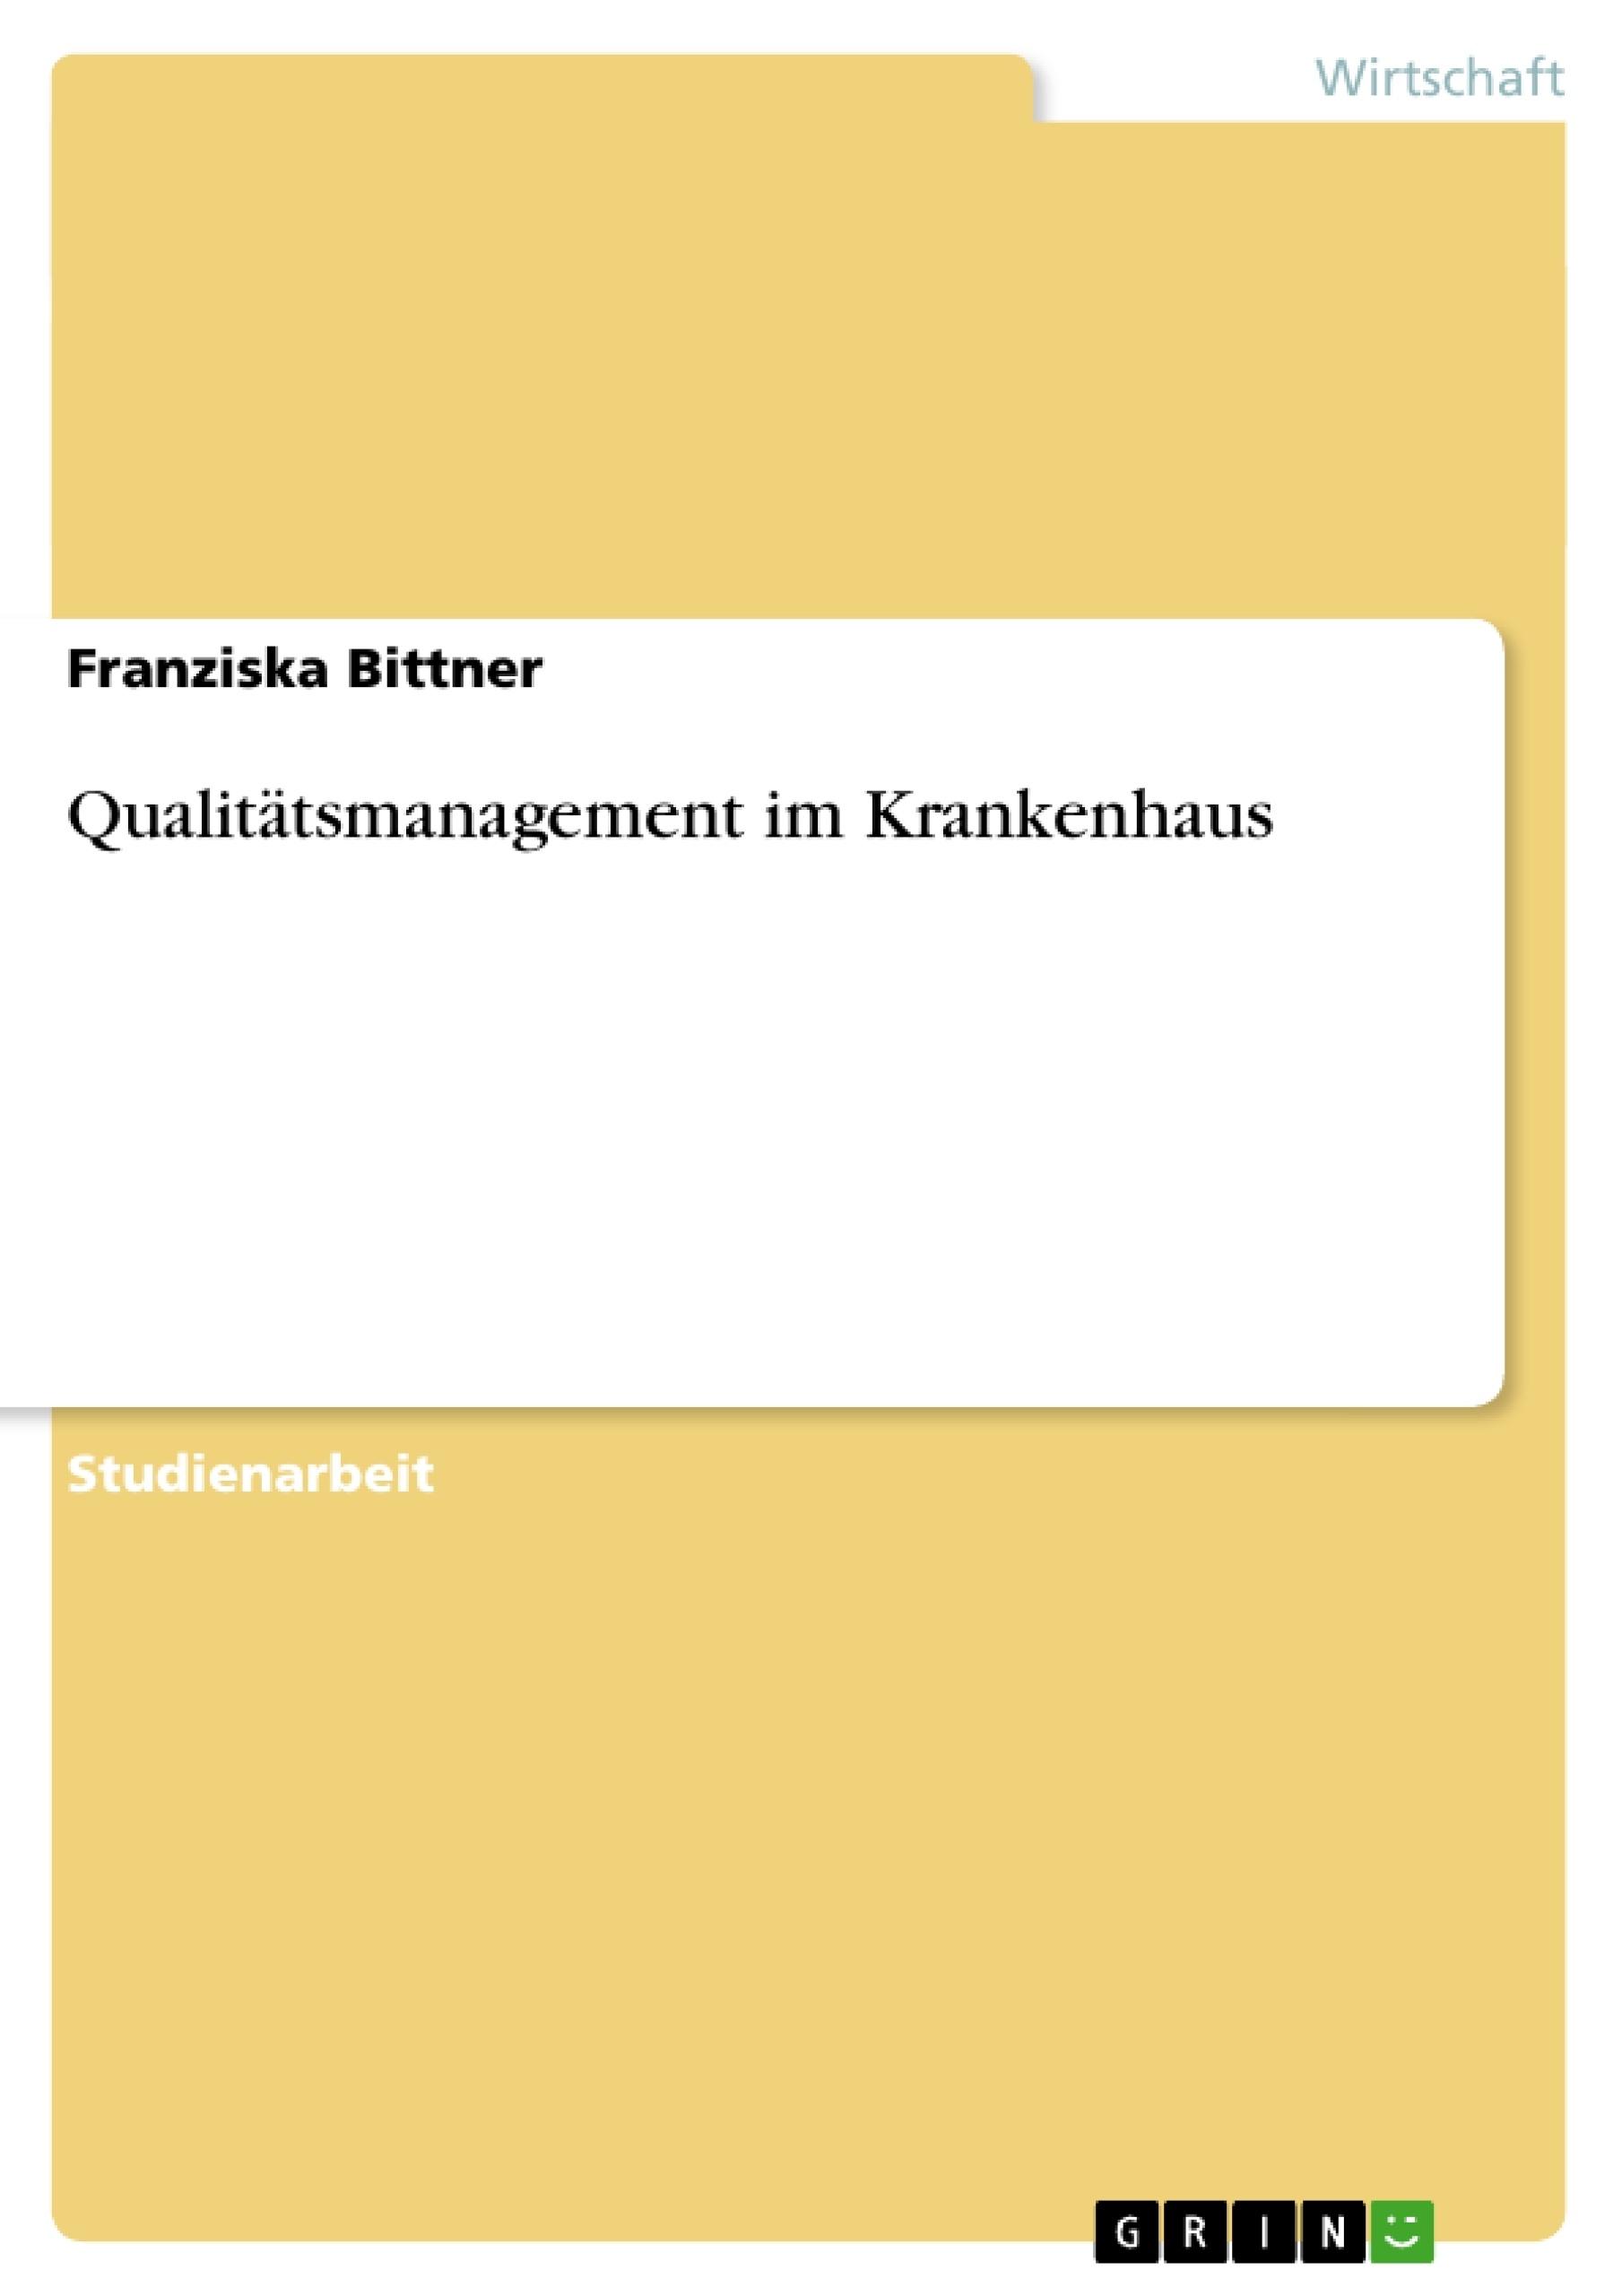 Titel: Qualitätsmanagement im Krankenhaus